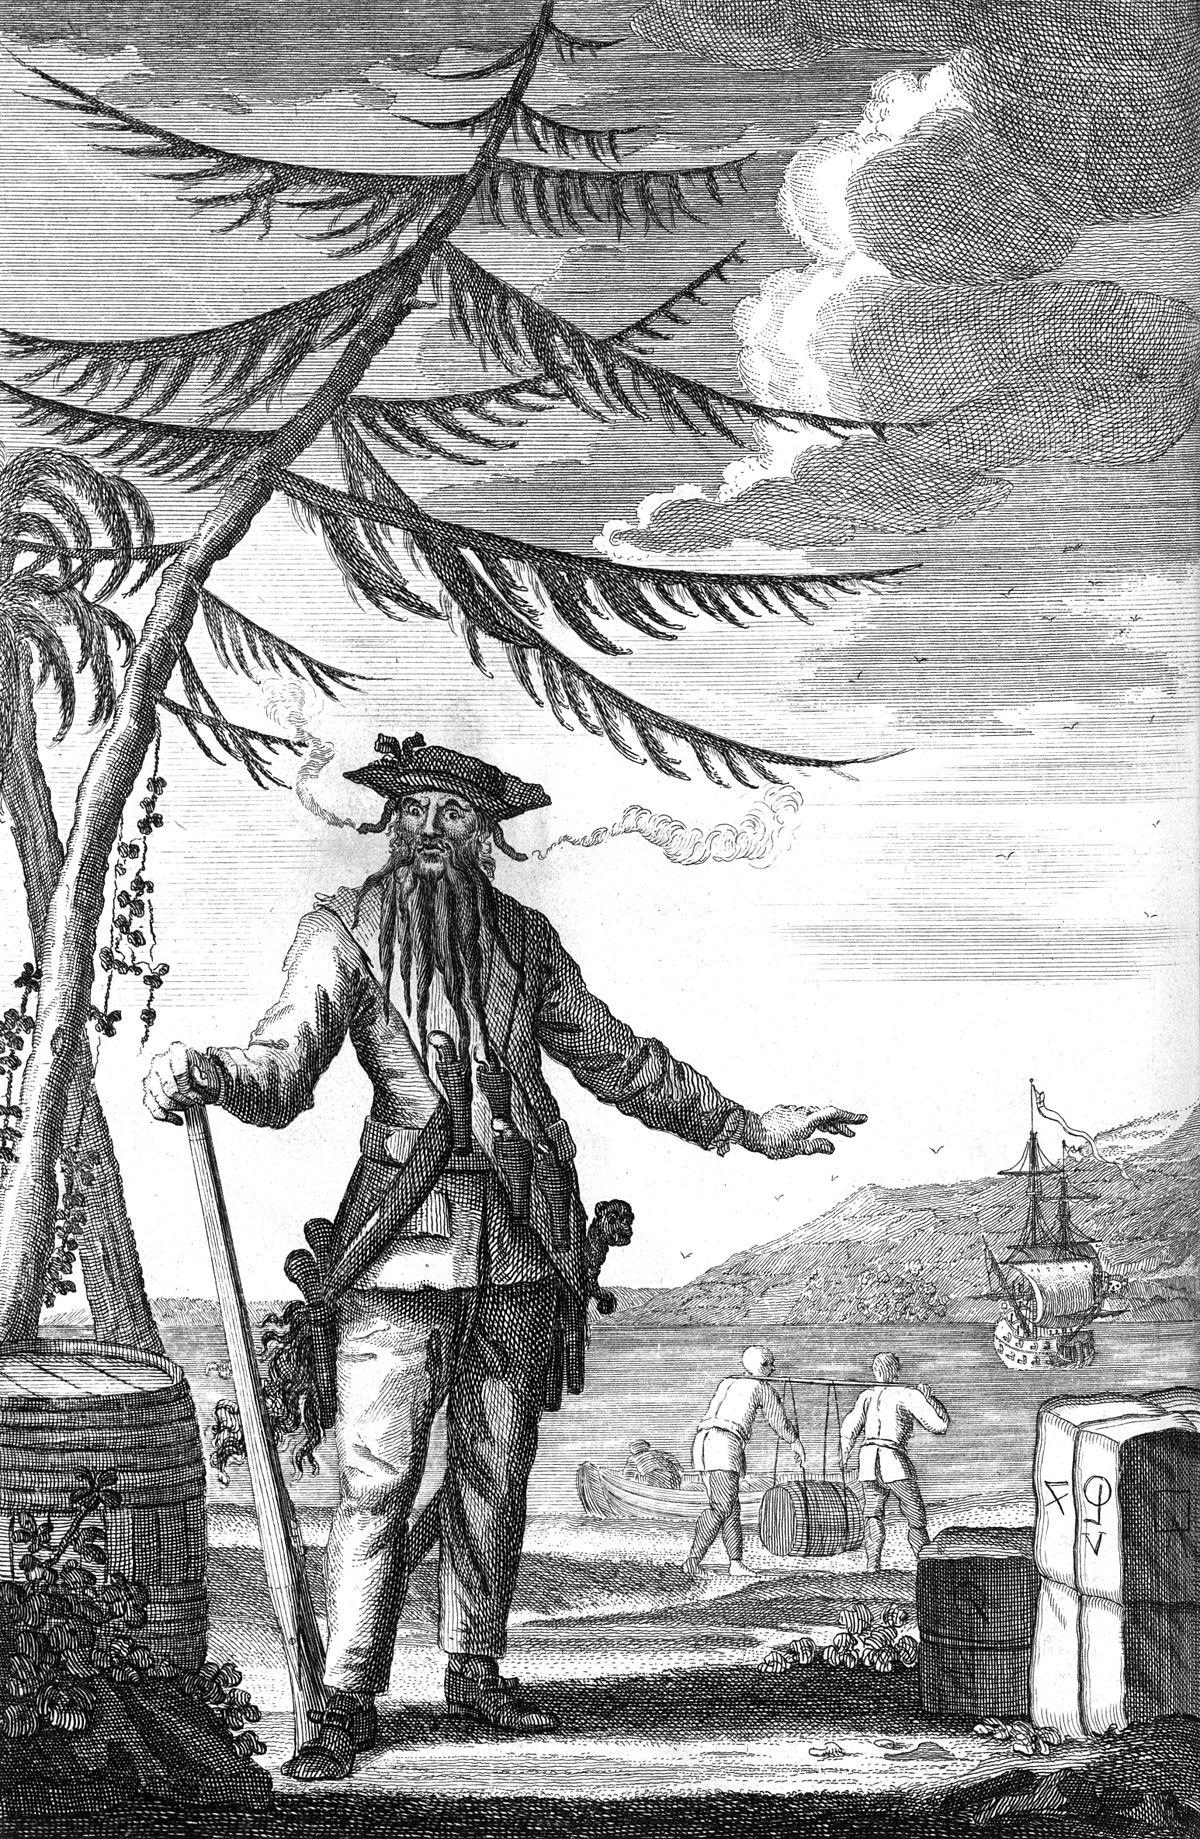 Descubren fragmentos de un libro que estaba leyendo el pirata Barbanegra